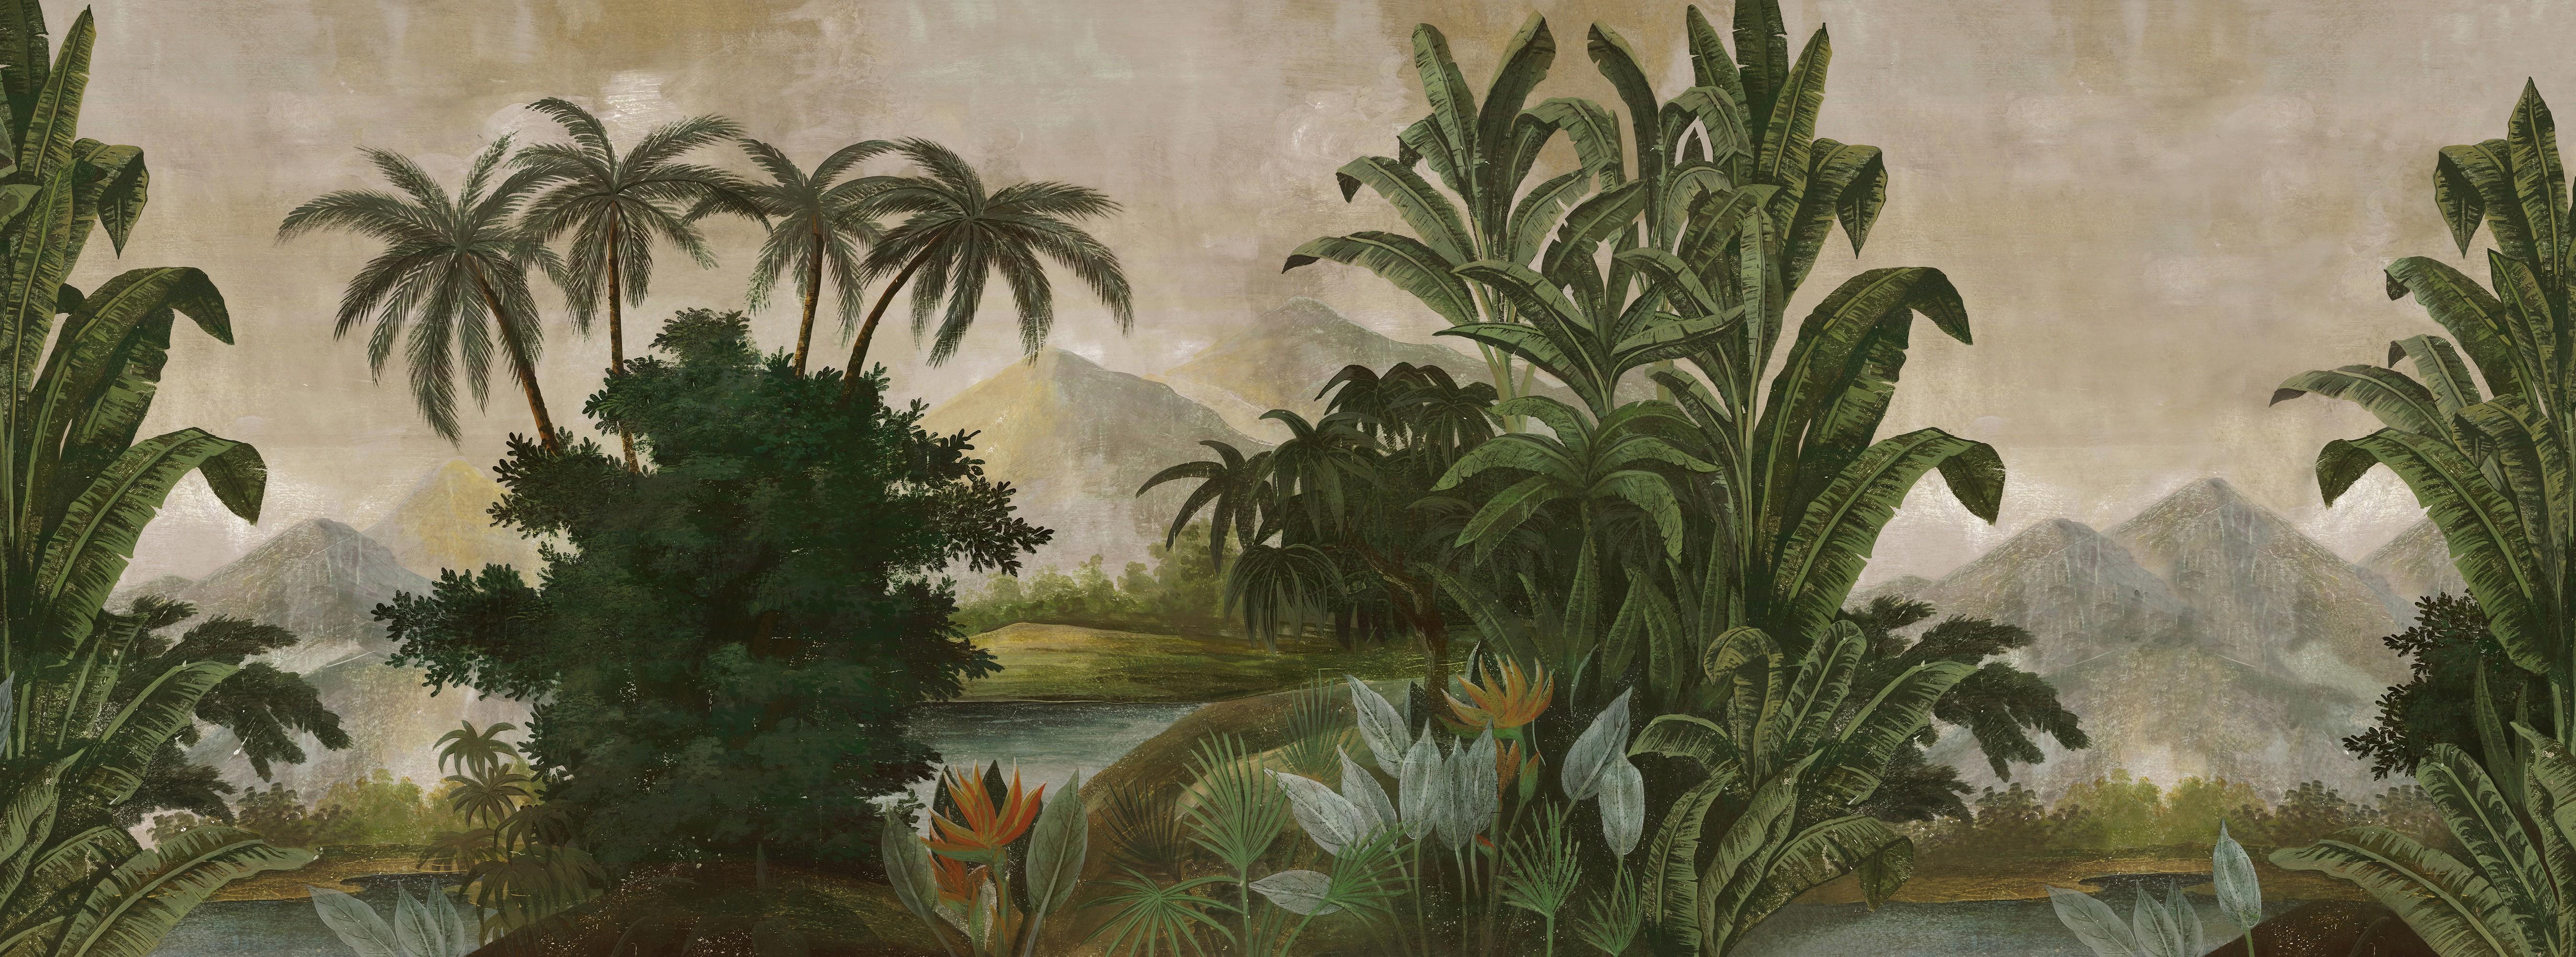 Papier Peint Panoramique Ananbô Tana Couleur